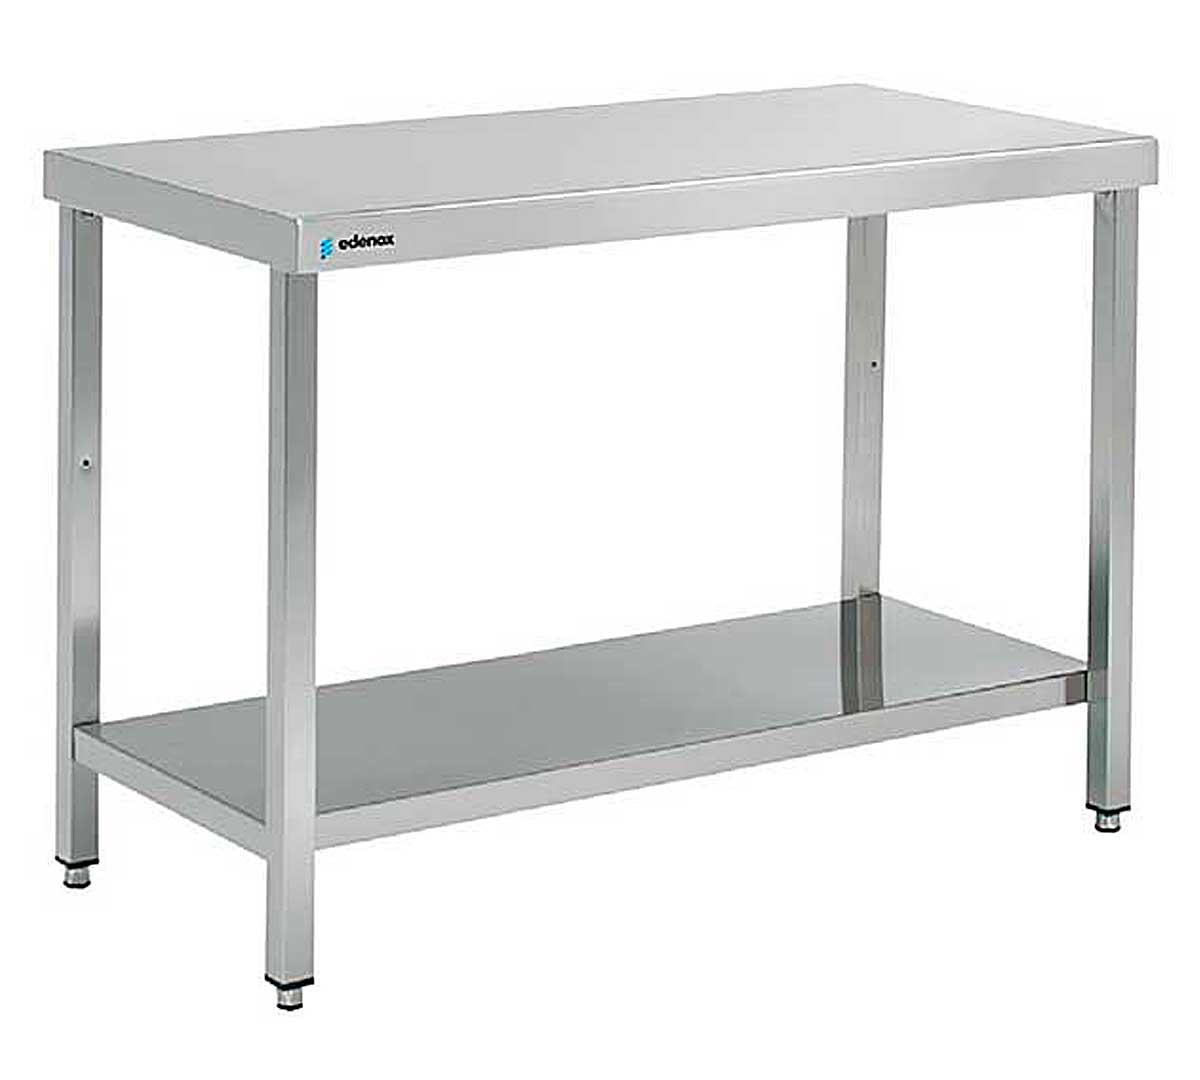 Mesa central gama 600 de edenox for Mesas de trabajo para cocina